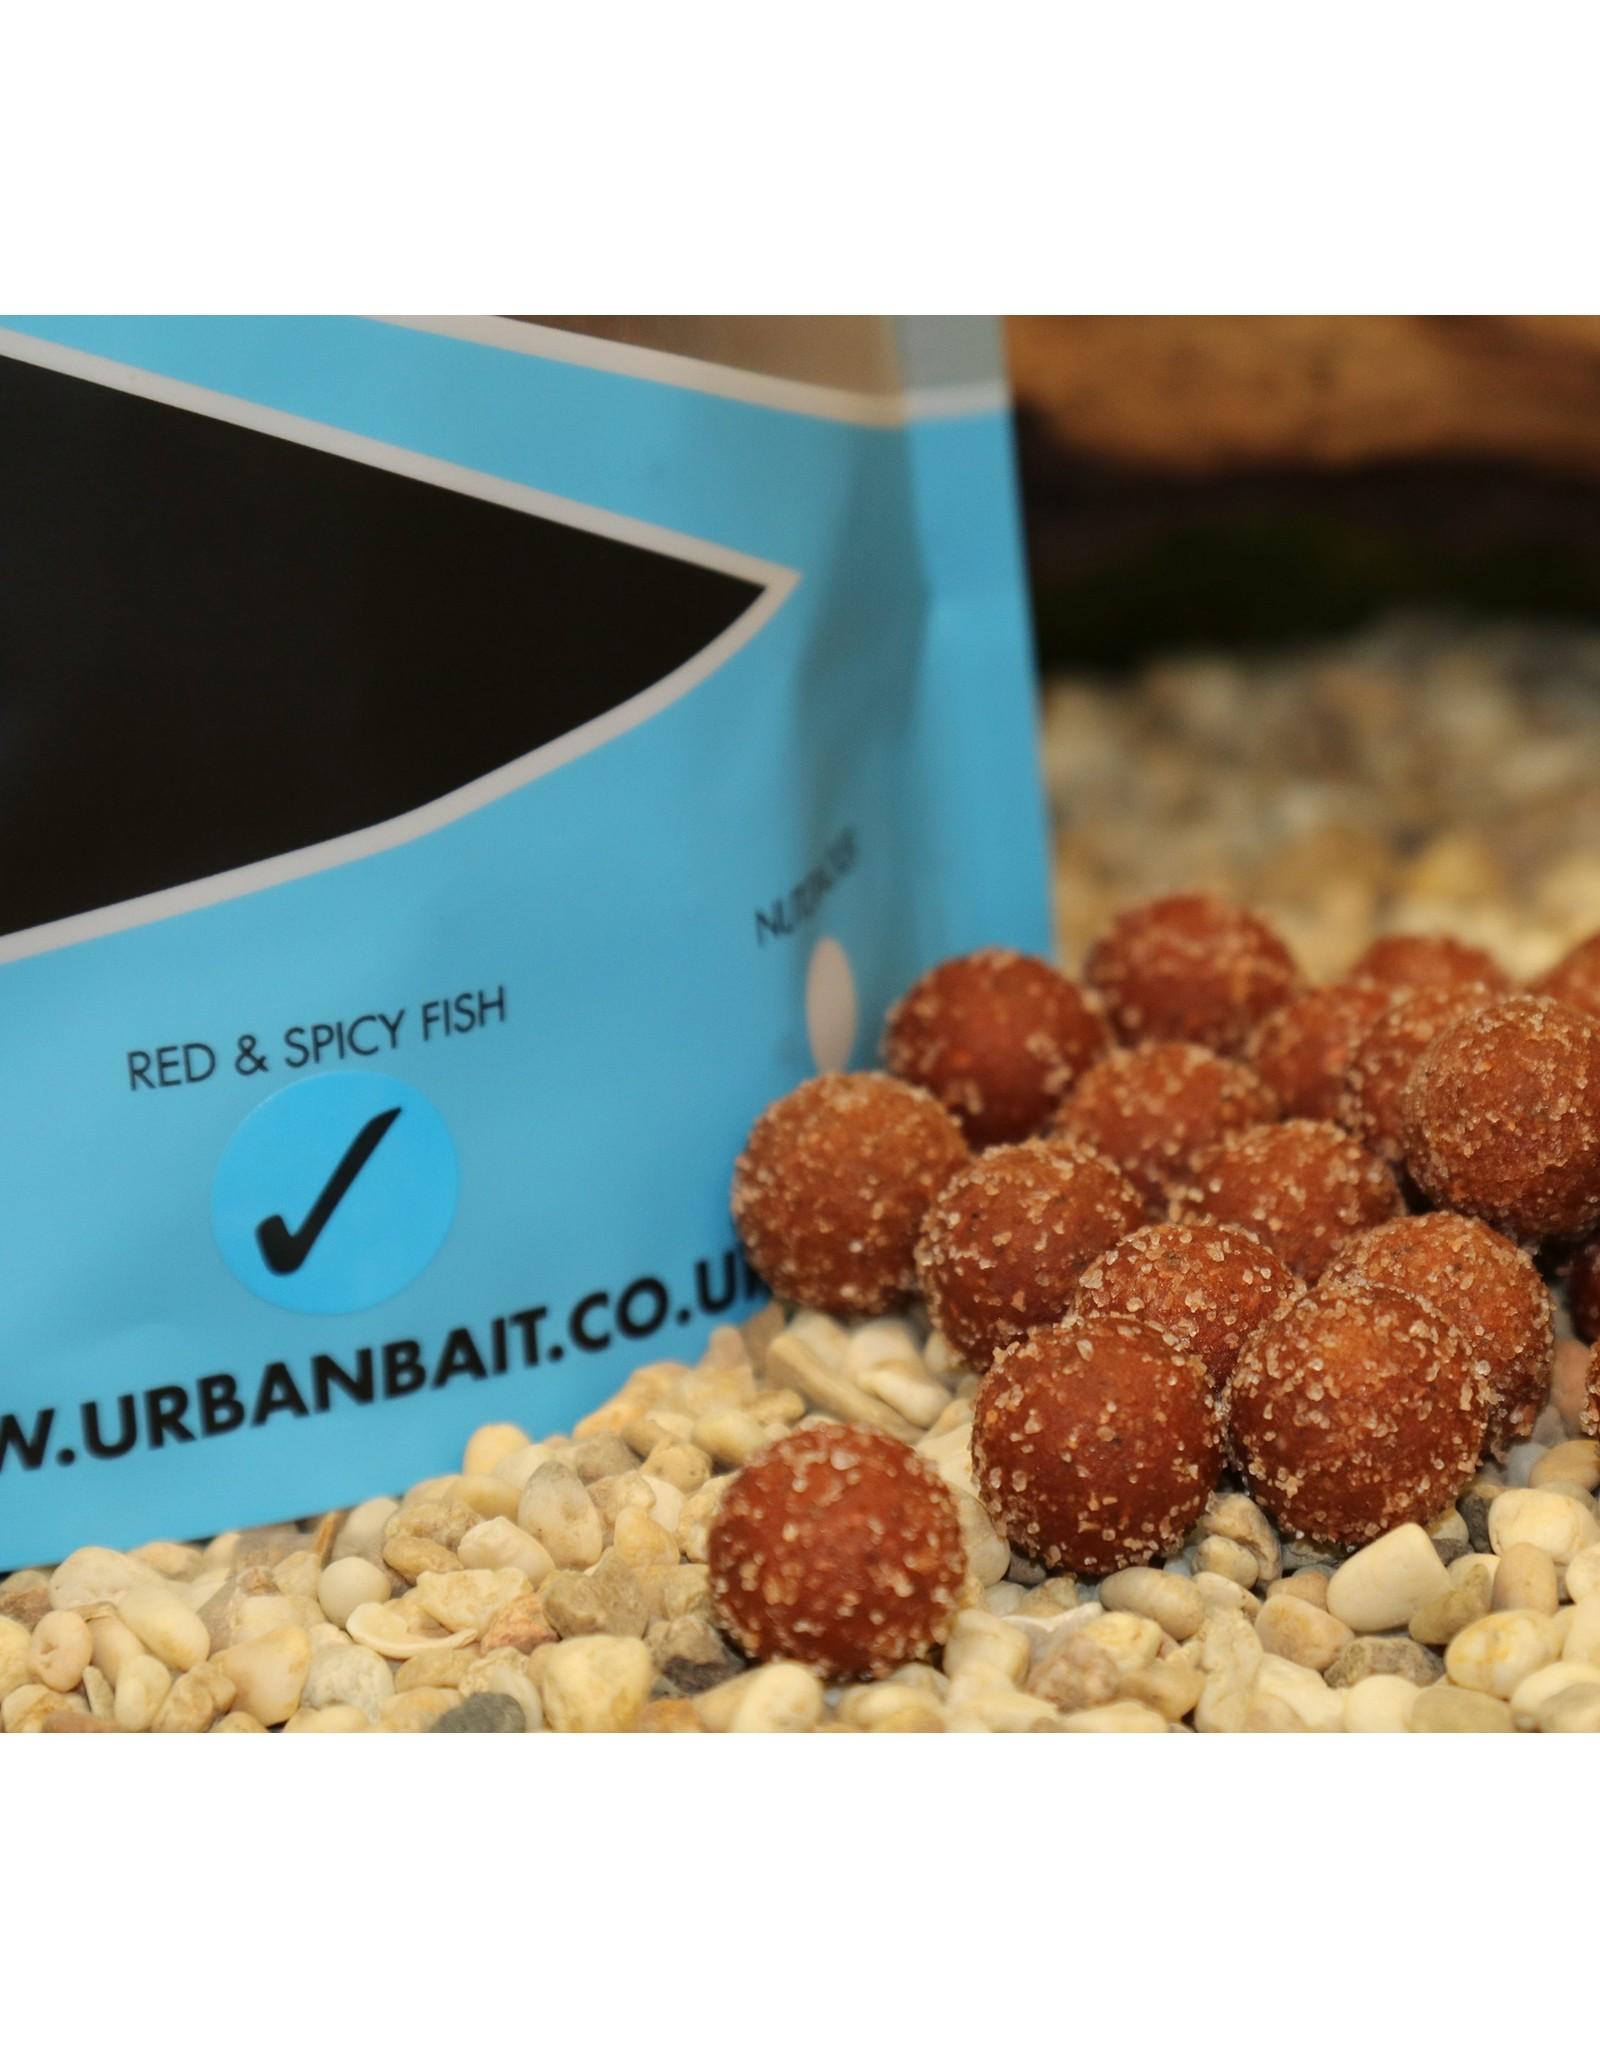 Urban Bait Urban Bait Red Spicy Fish Himalayan Salt Boilie 1kg